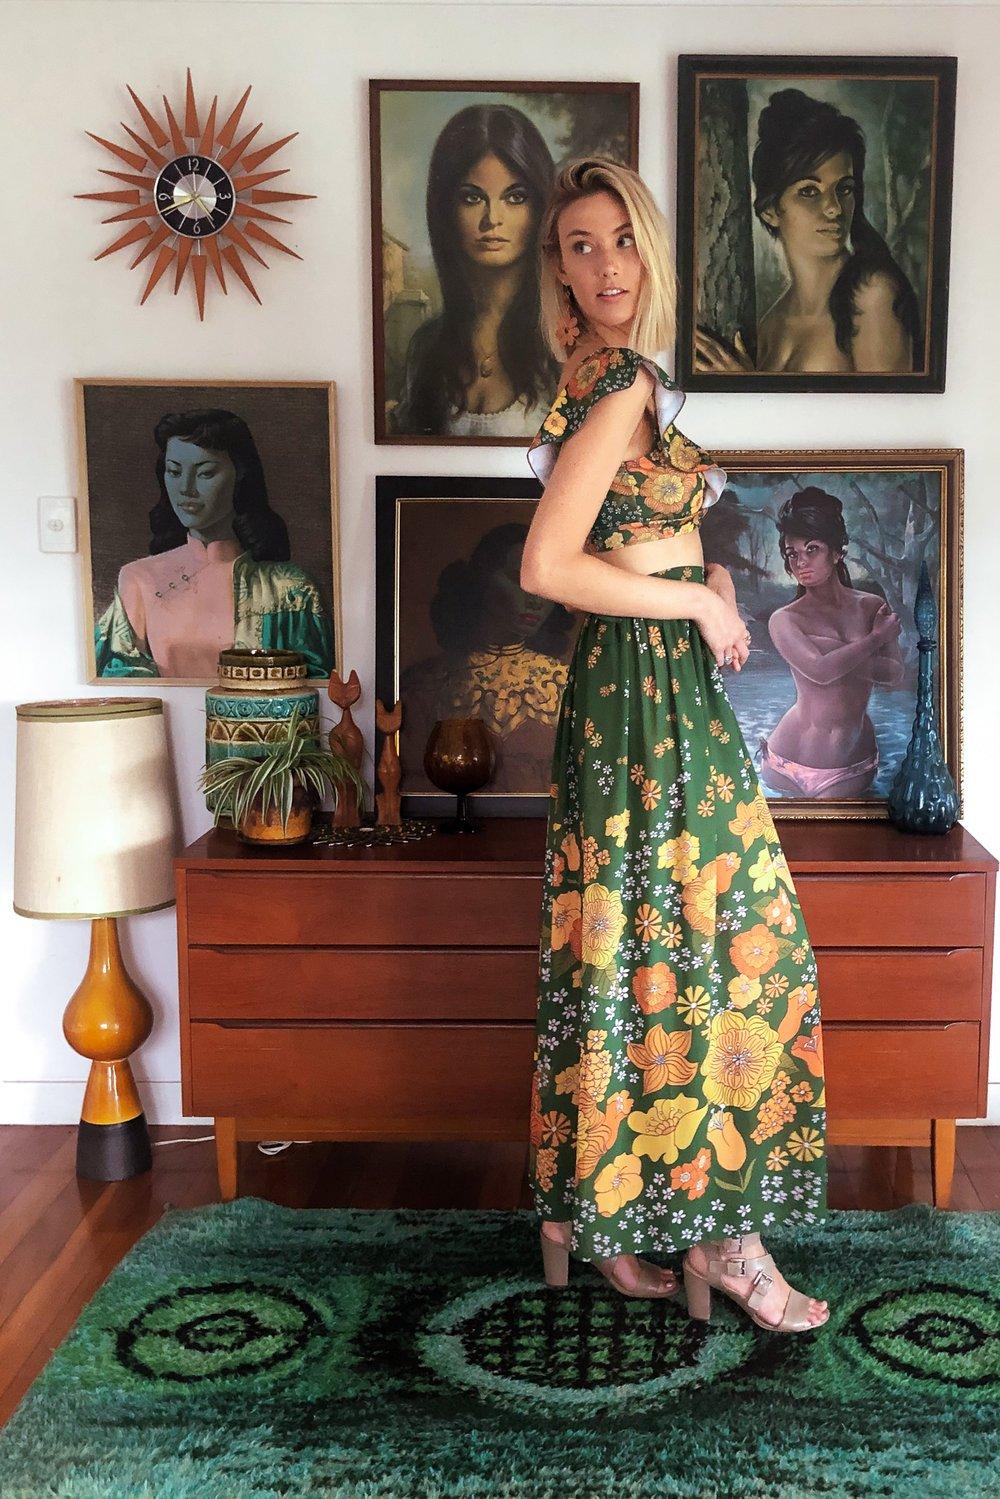 Chiffon wrap skirt in Groovy garden green